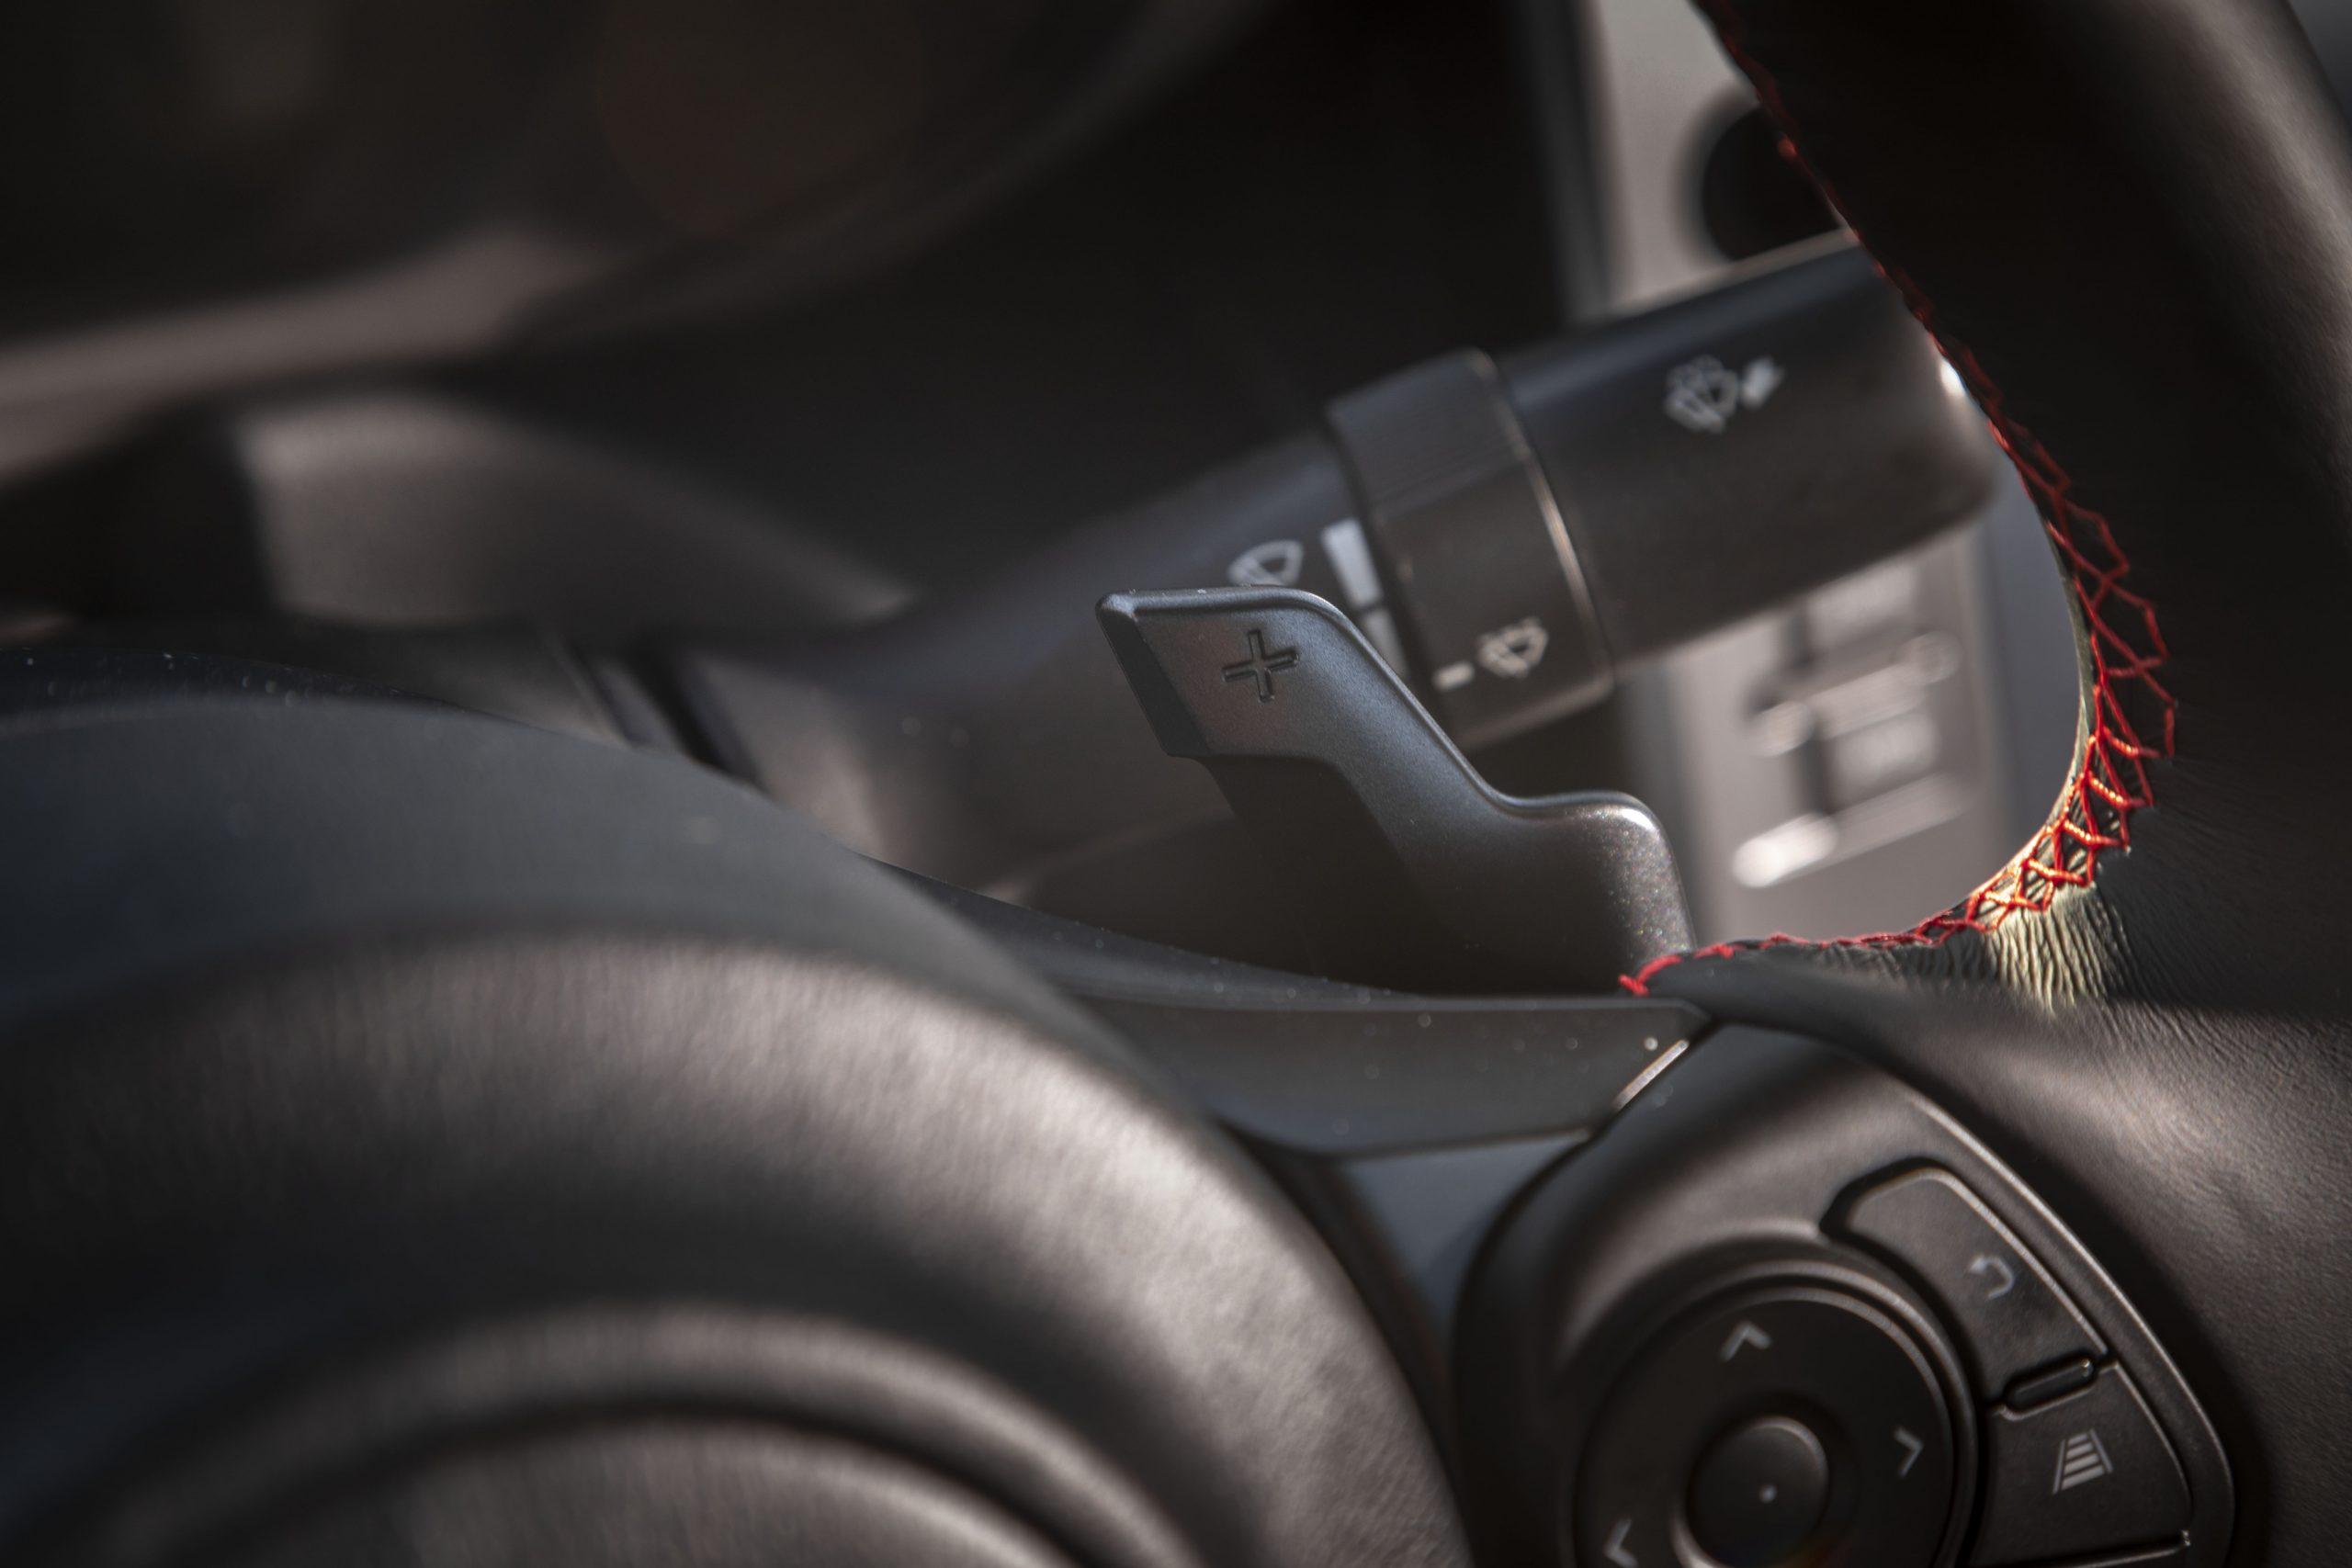 2022 Subaru BRZ interior paddle shifter detail